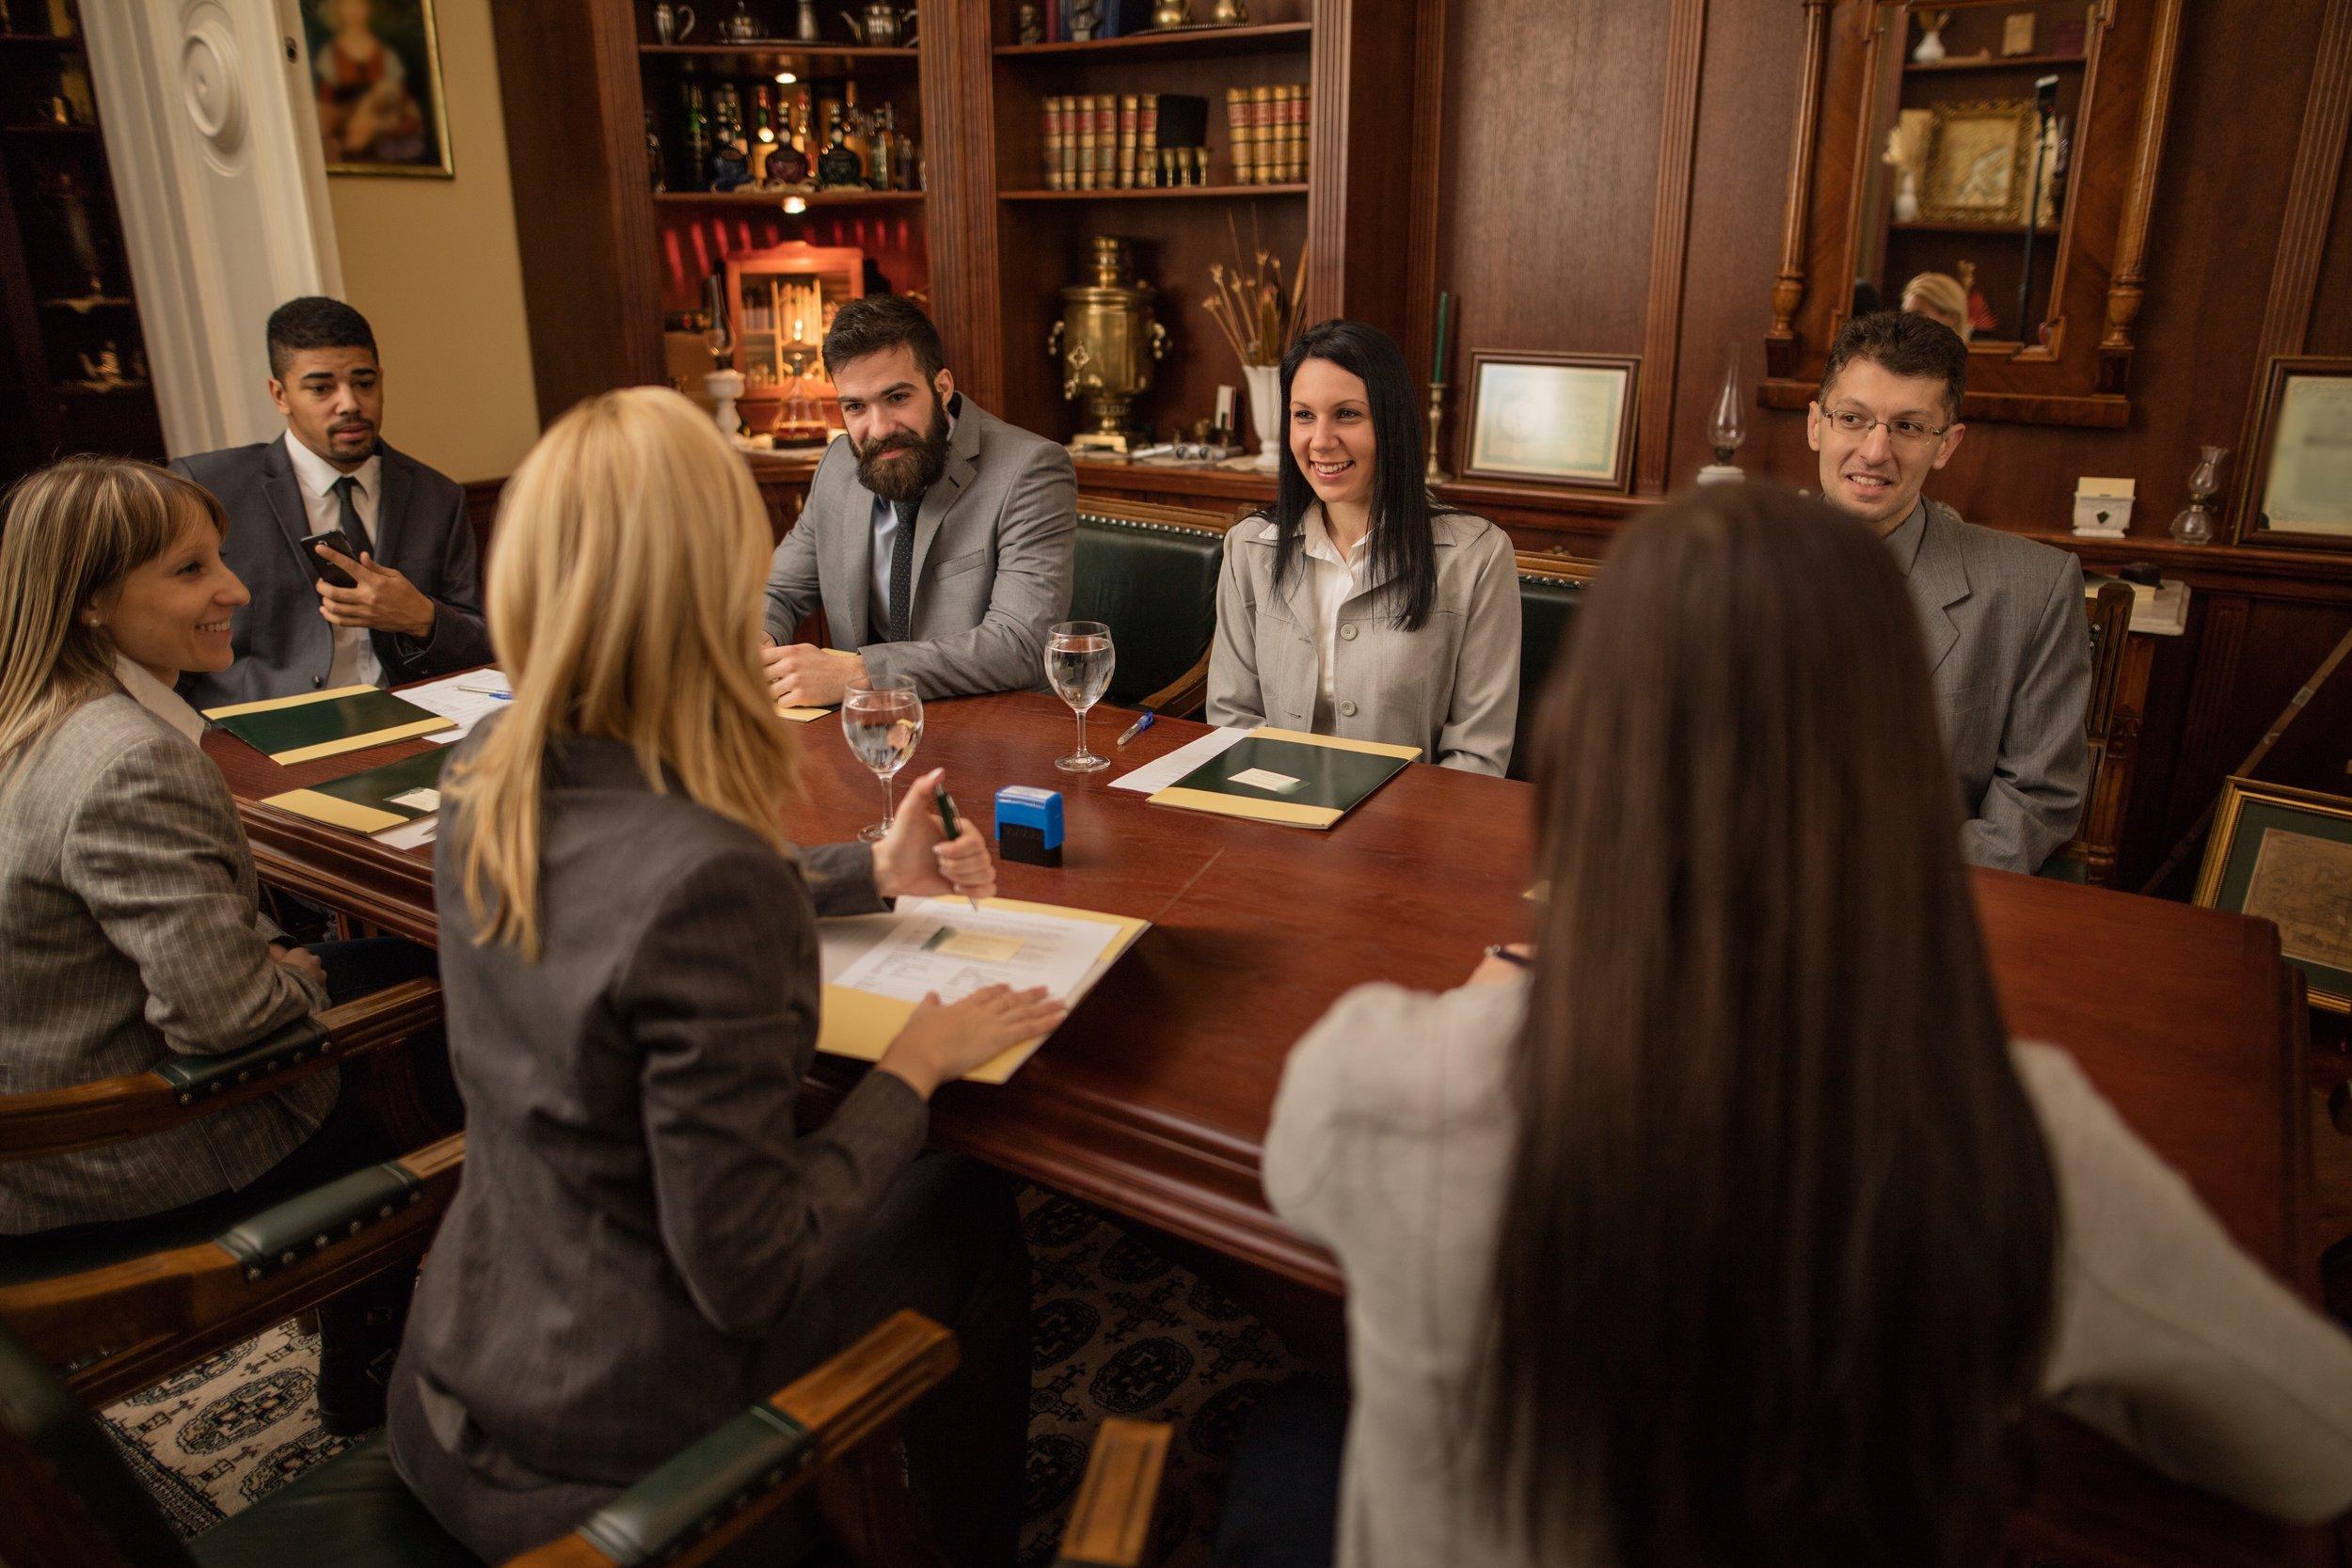 Legal Team In Conf Room.jpg